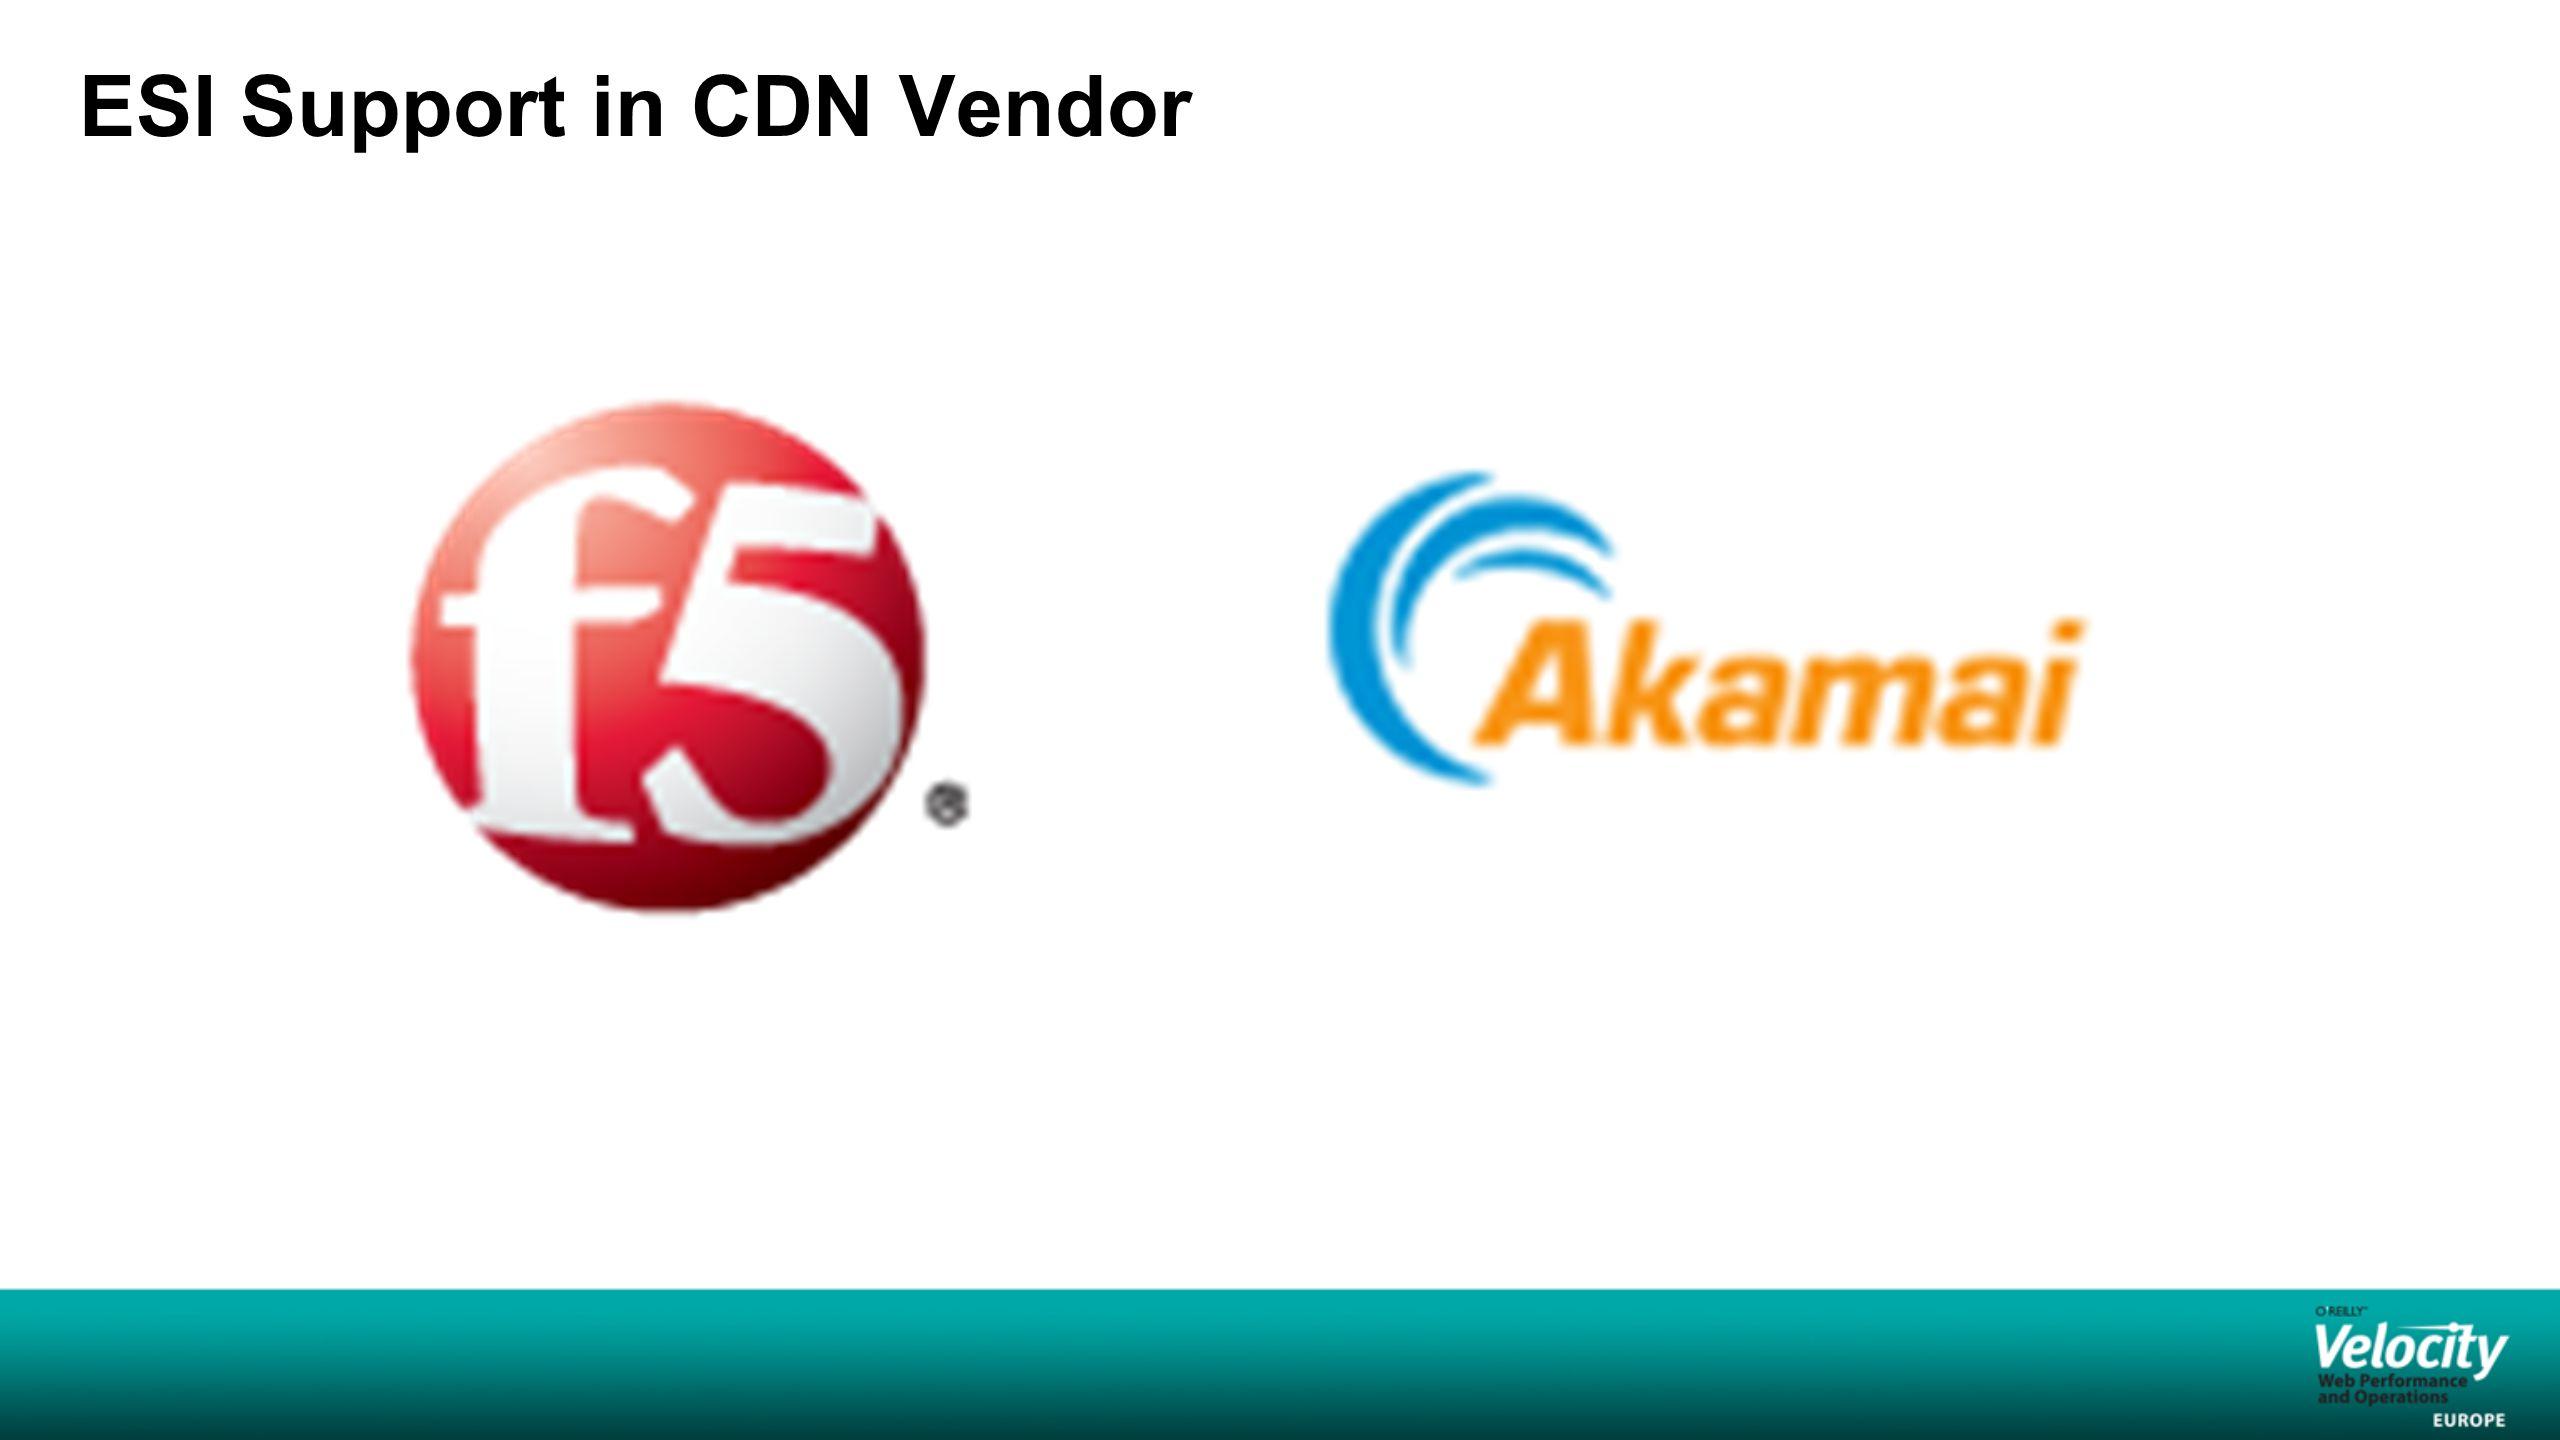 ESI Support in CDN Vendor